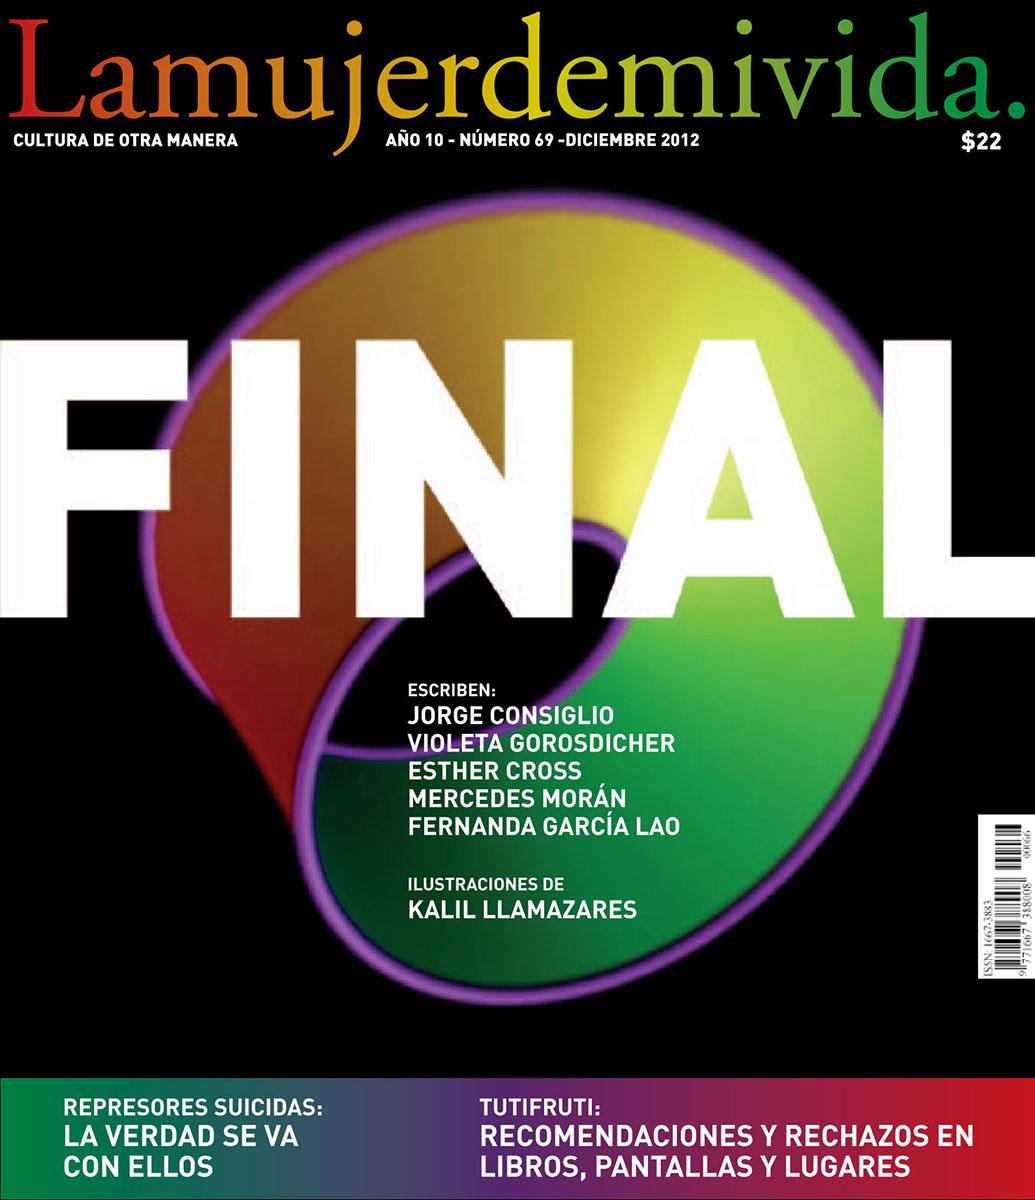 LAMUJERDEMIVIDA-3